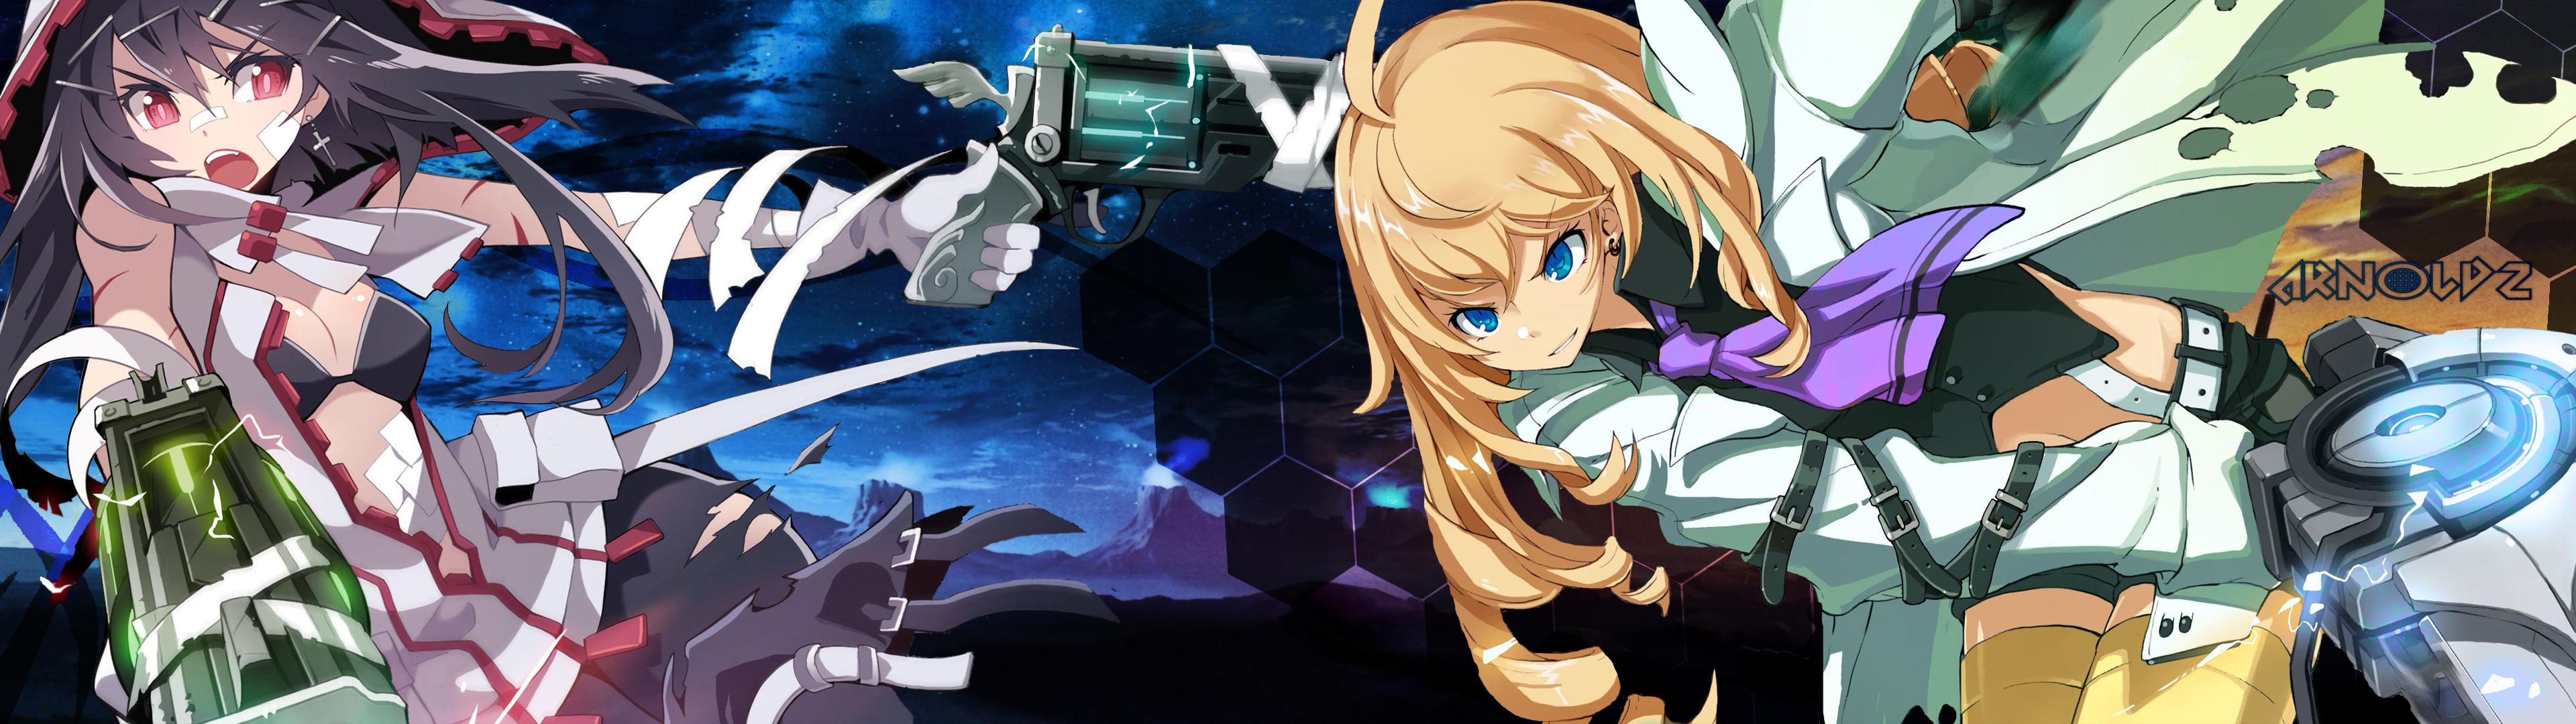 ... Anime Girls Dual Screen/Moniter [3840x1080] by iarnoldz